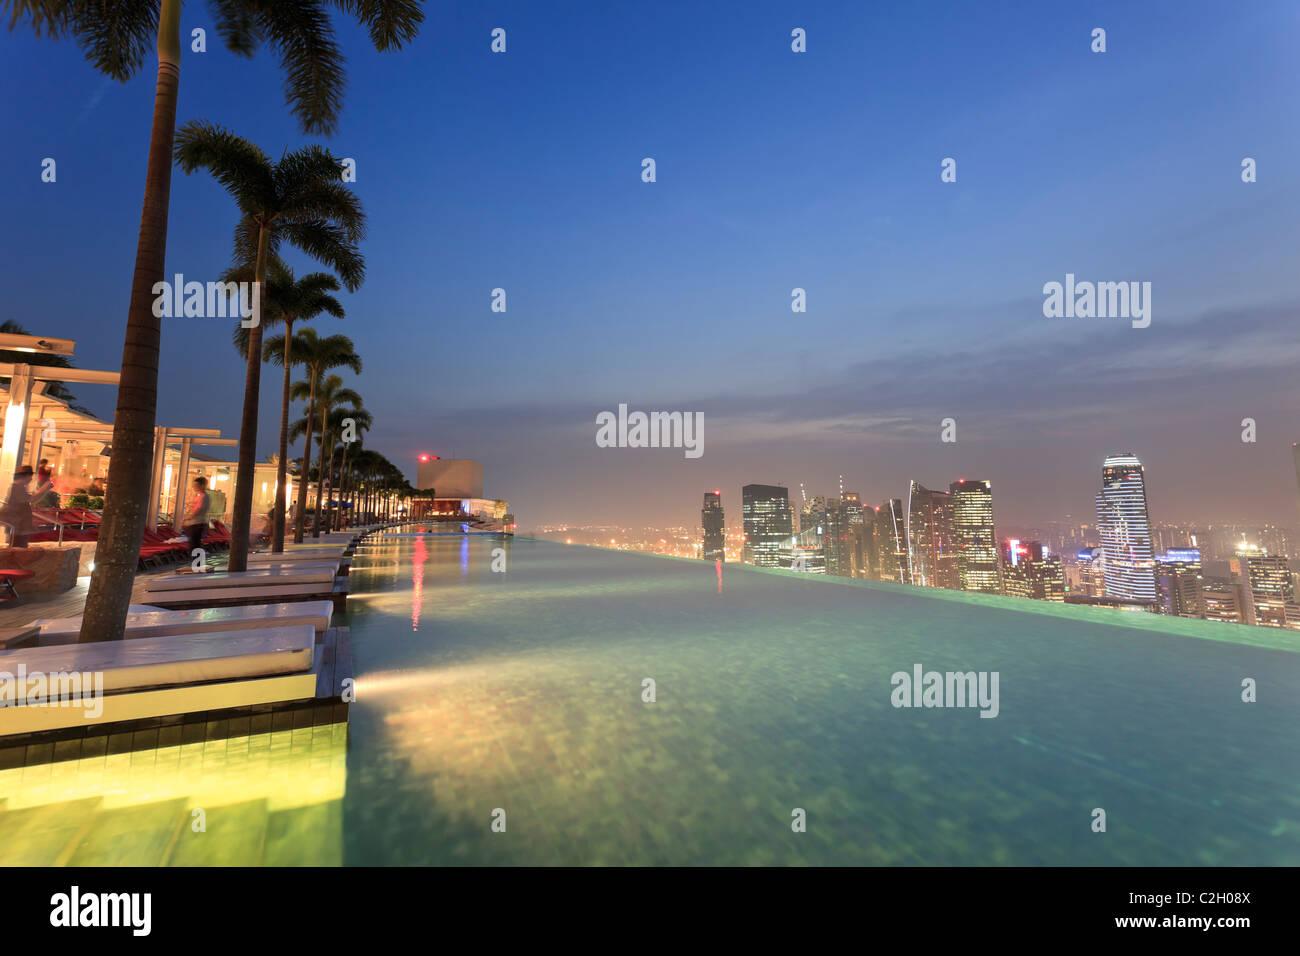 Singapore, swimmingpool and Singapore Skyline on the 57th floor of Marina Bay Sands Resort - Stock Image